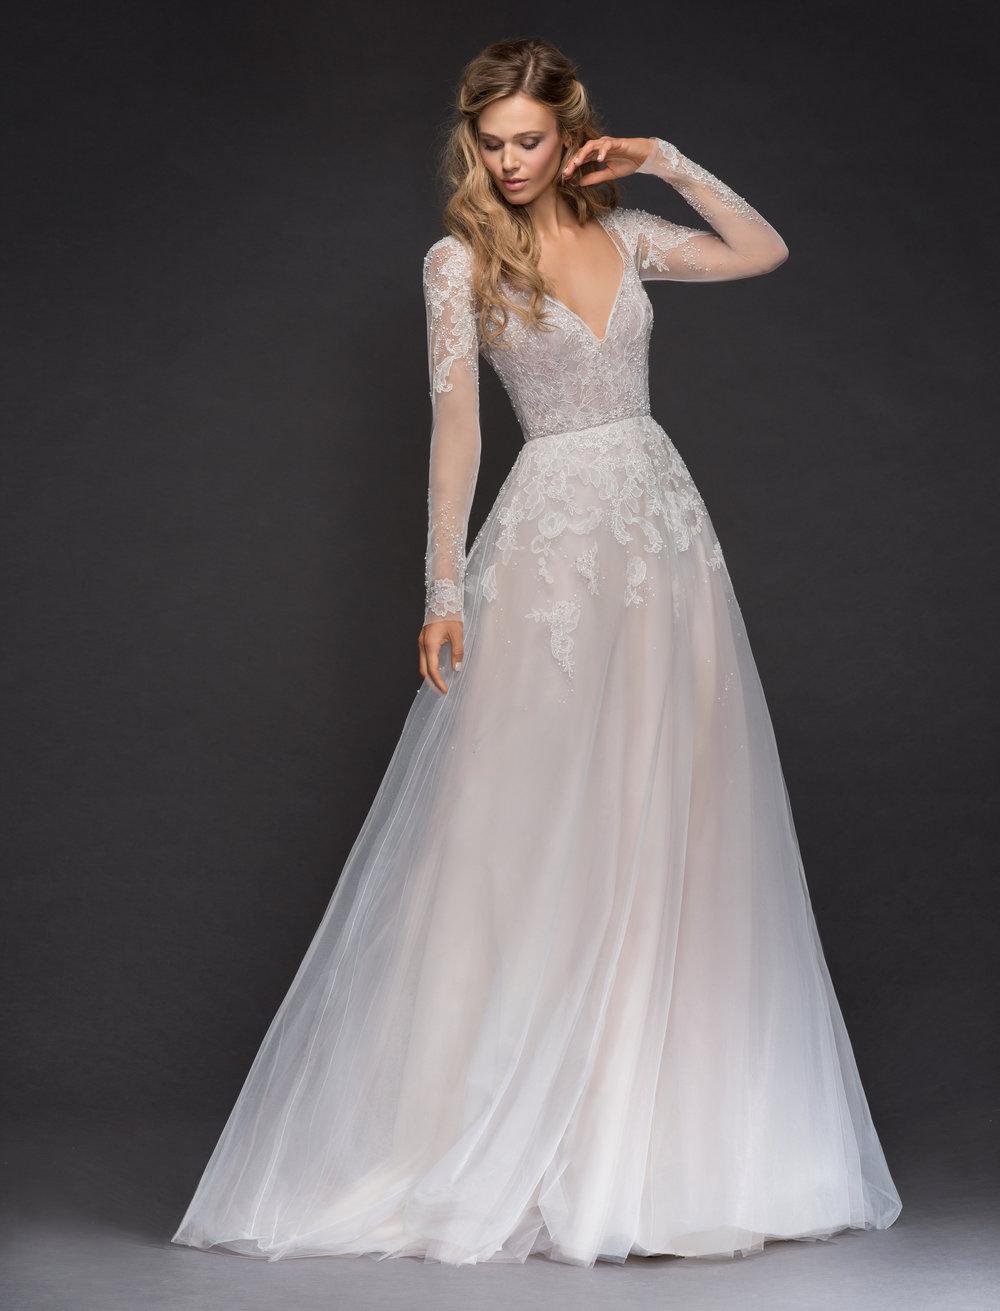 hayley-paige-bridal-spring-2018-style-6808-mara_1.jpg